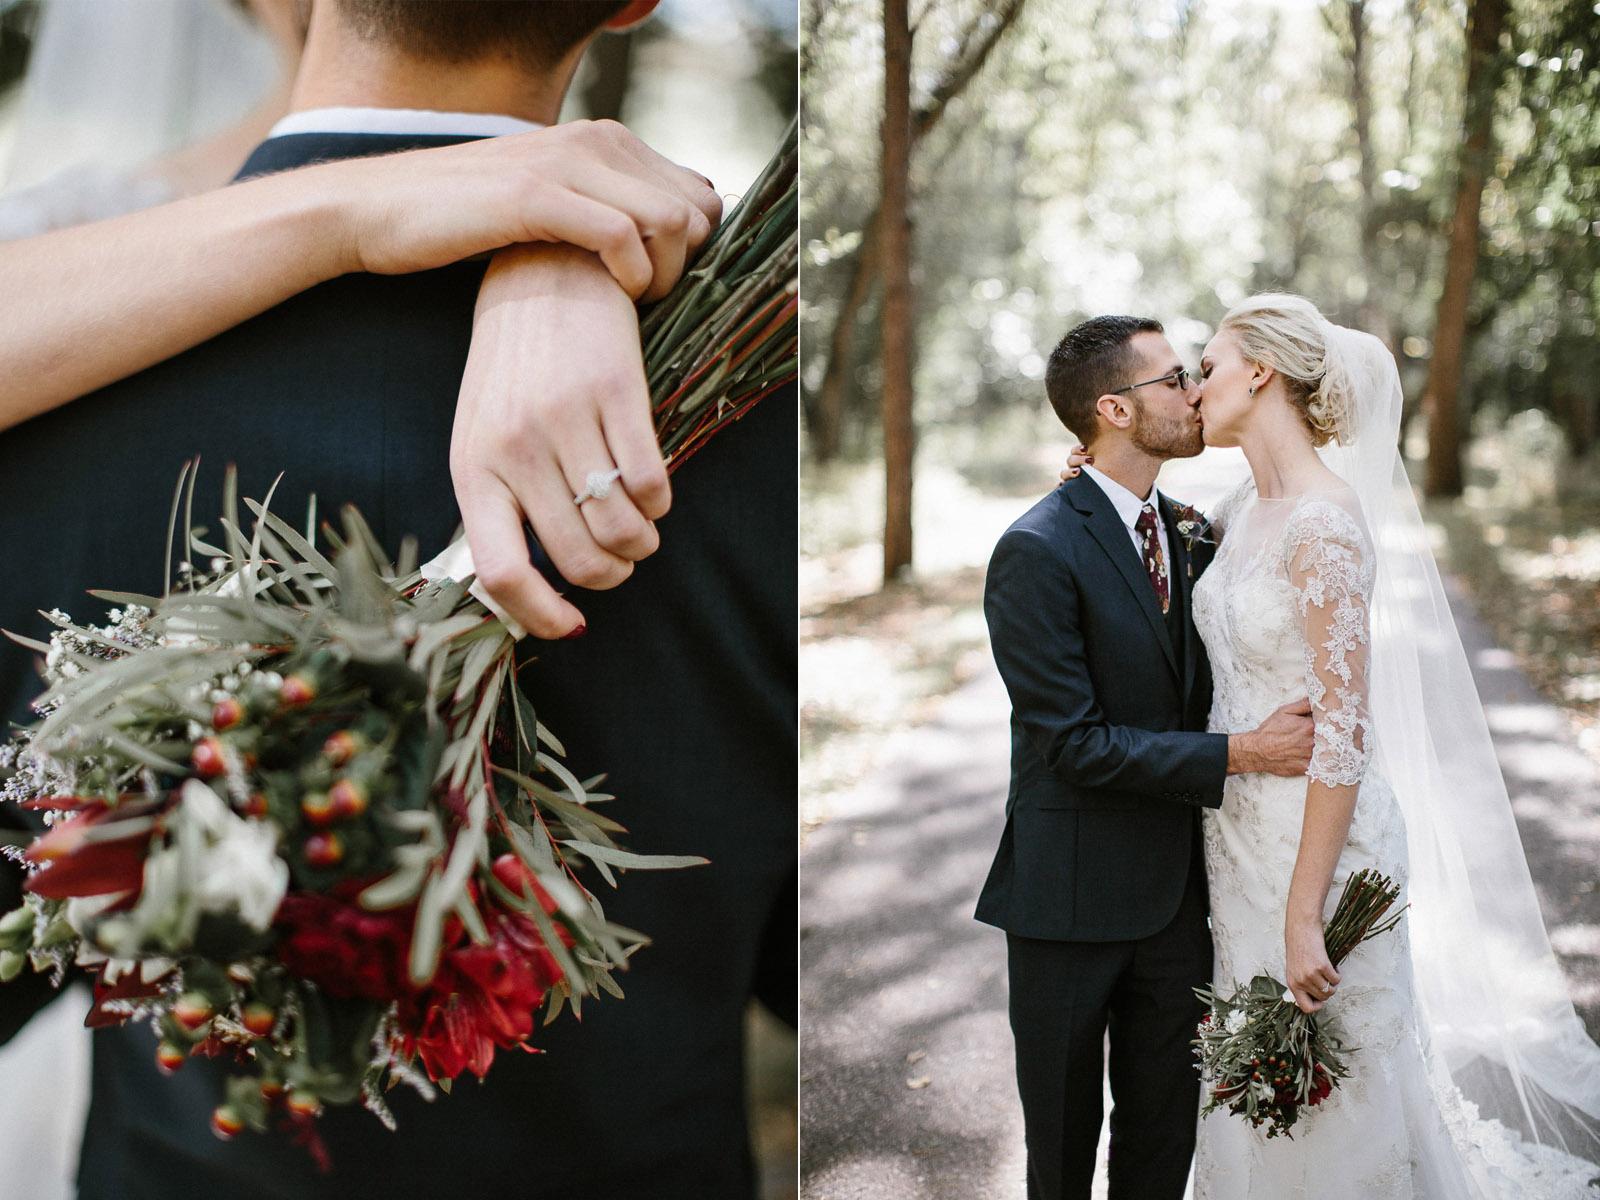 Jenna&Austin_SiouxFalls_Wedding_Photographer_044.jpg